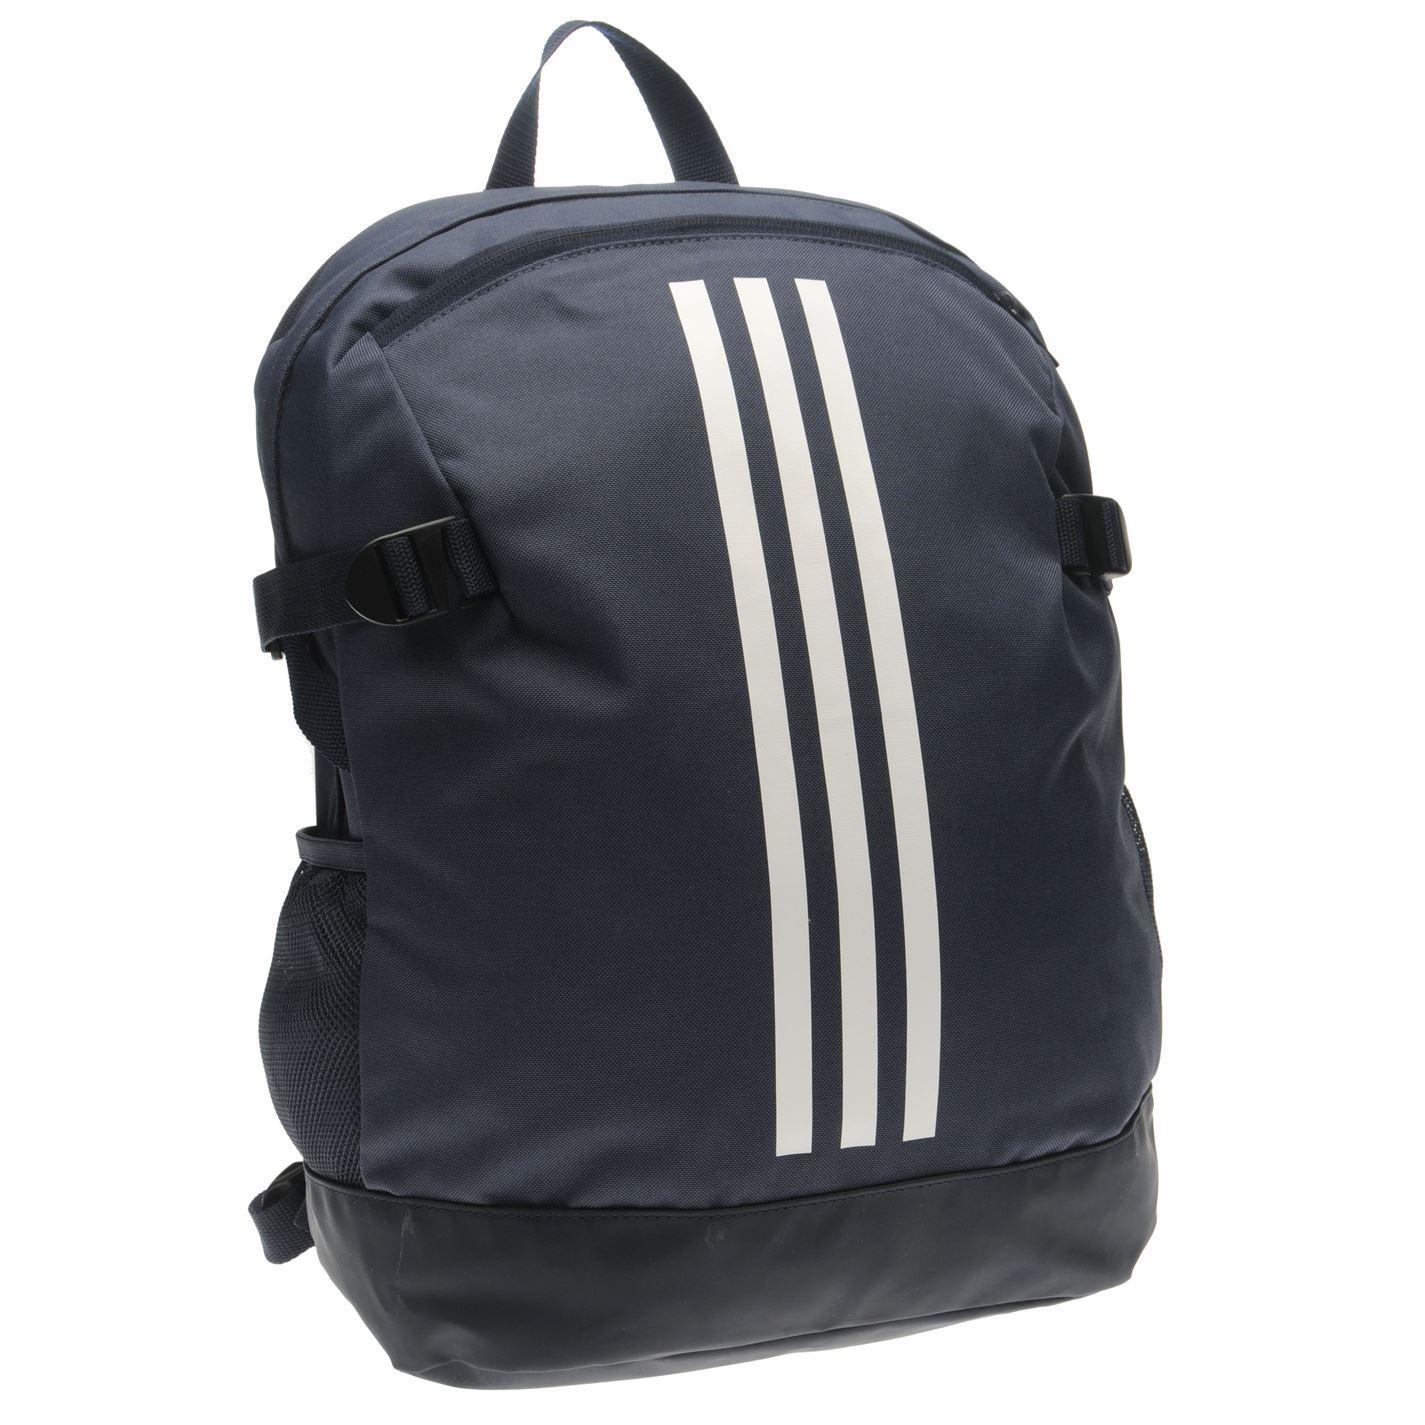 2014607f71 ... Adidas Power 4 mochila azul marino blanco deportes bolsa bolsa mochila  ...